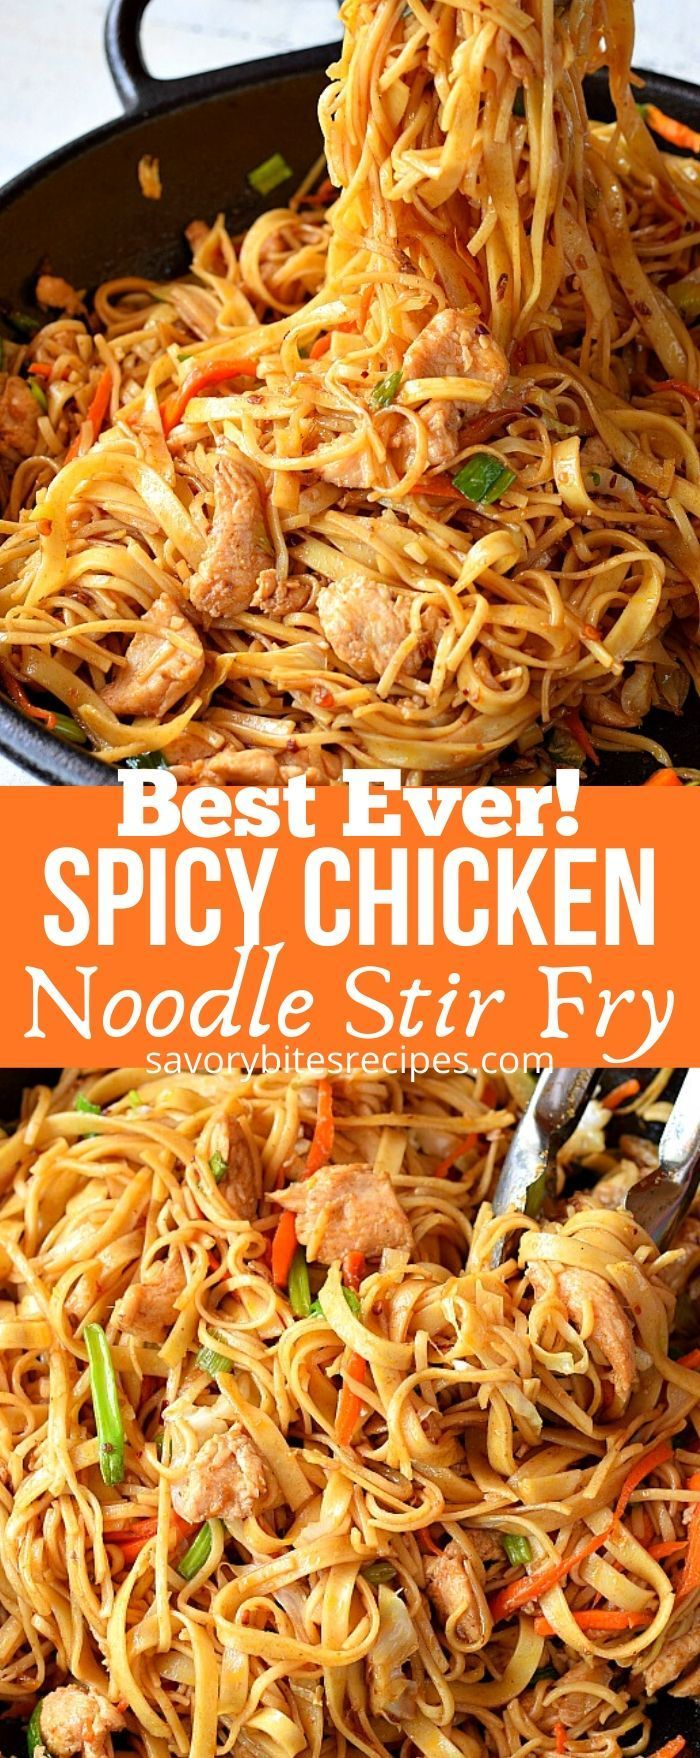 Best Chicken Noodle Stir Fry Recipe Noodle Recipes Easy Spicy Chicken Noodles Chicken Stir Fry With Noodles